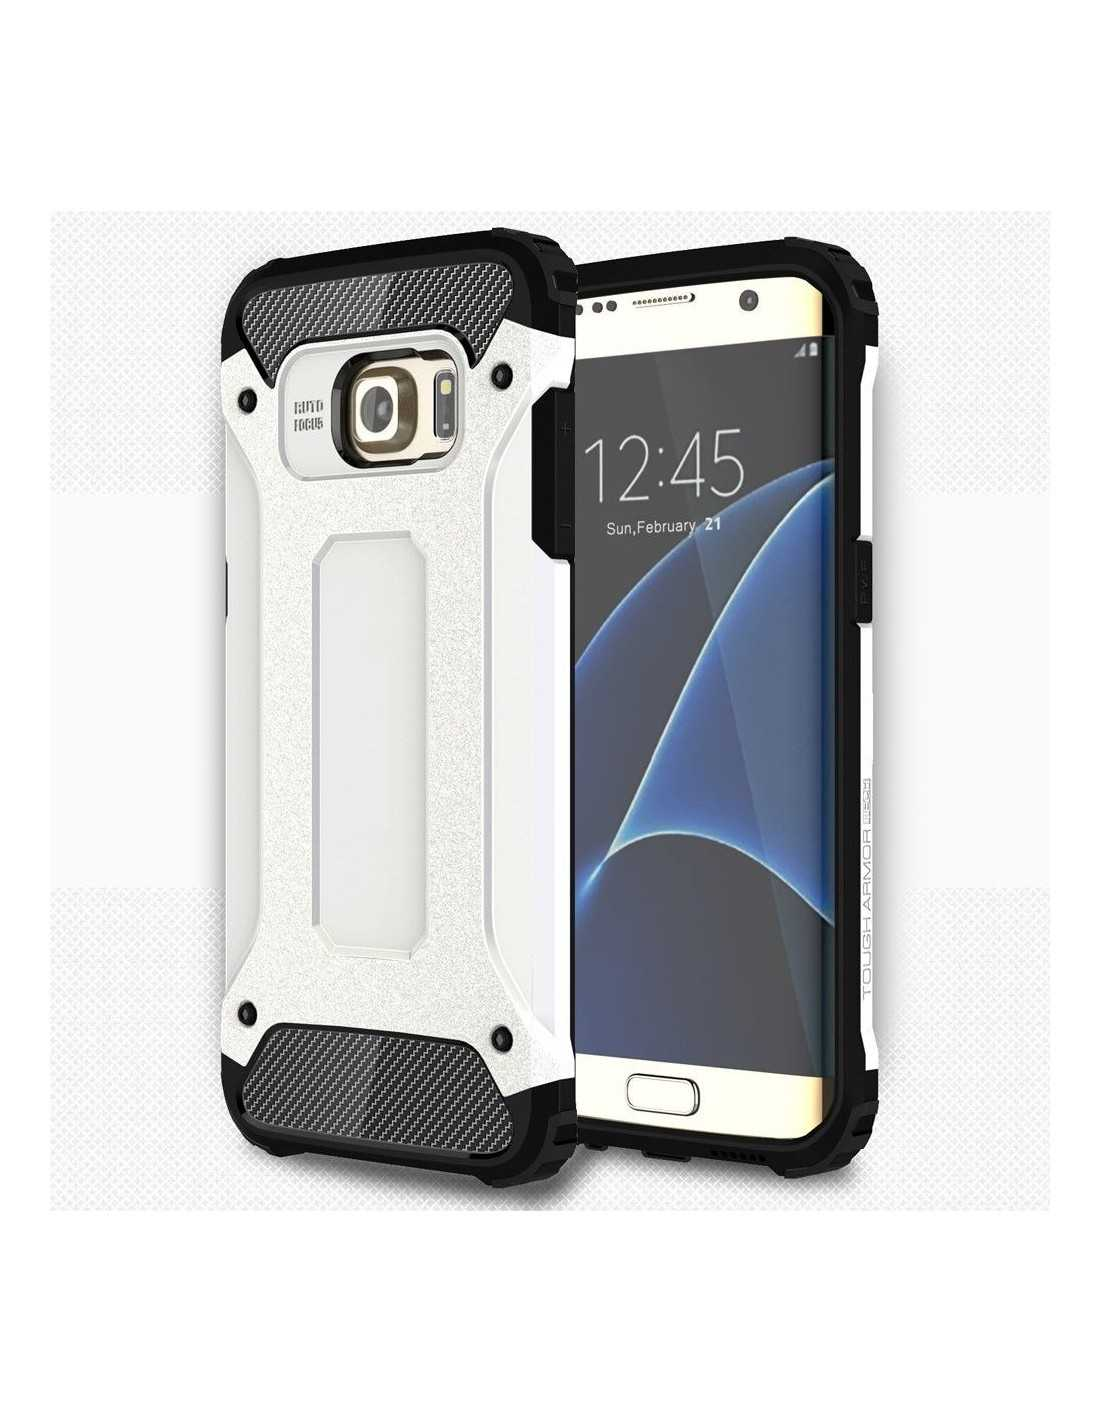 Coque antichoc Samsung Galaxy S7 edge hybride Cool armor Blanc